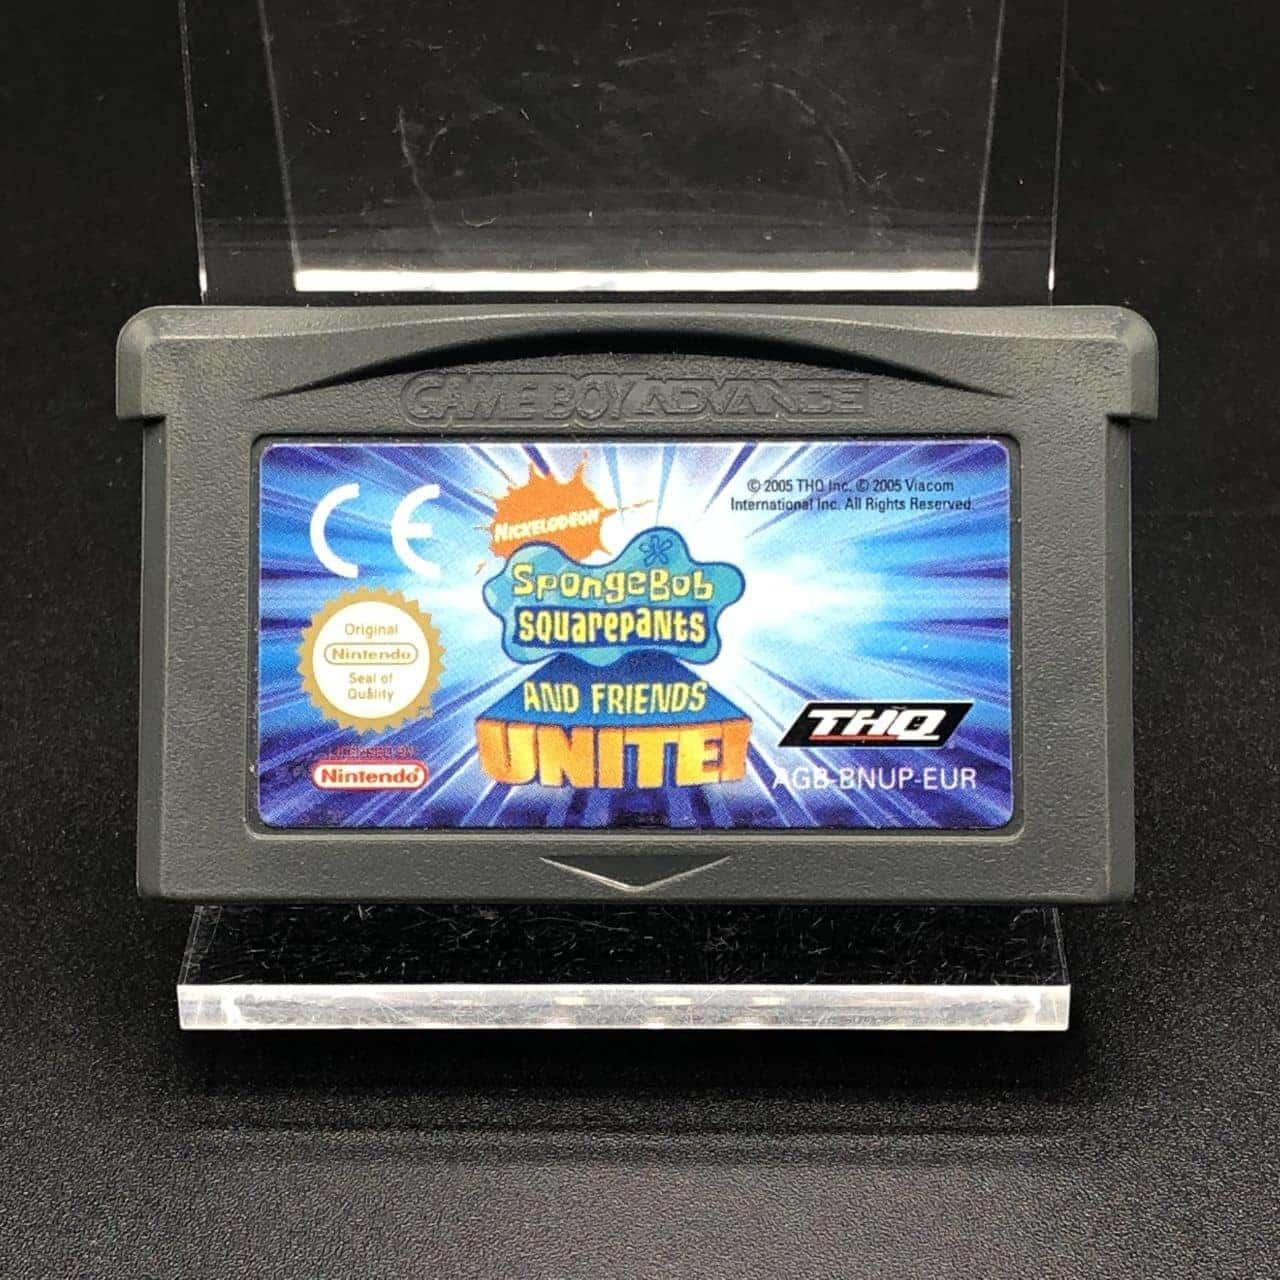 GBA SpongeBob SquarePants and Friends Unite! (Modul) (Sehr gut) Nintendo Game Boy Advance